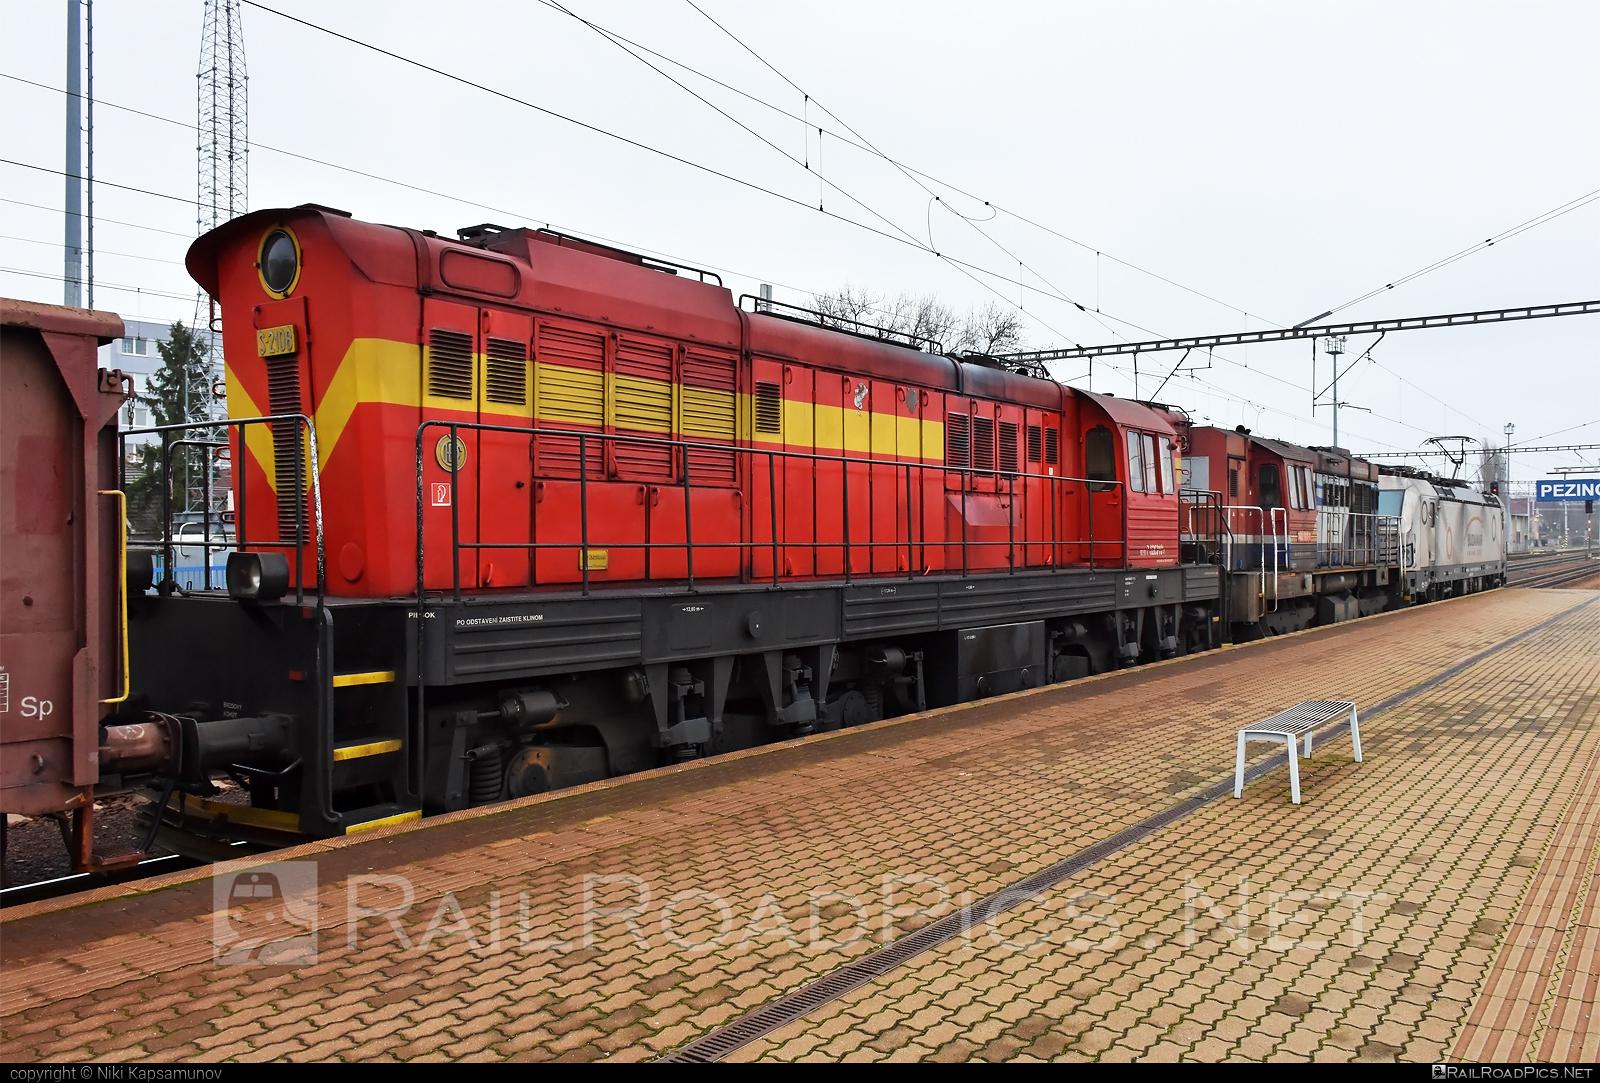 ČKD T 669.0 (770) - 620 010-1 operated by LOKORAIL, a.s. #ckd #ckd6690 #ckd770 #ckdt6690 #cmeliak #lokorail #lrl